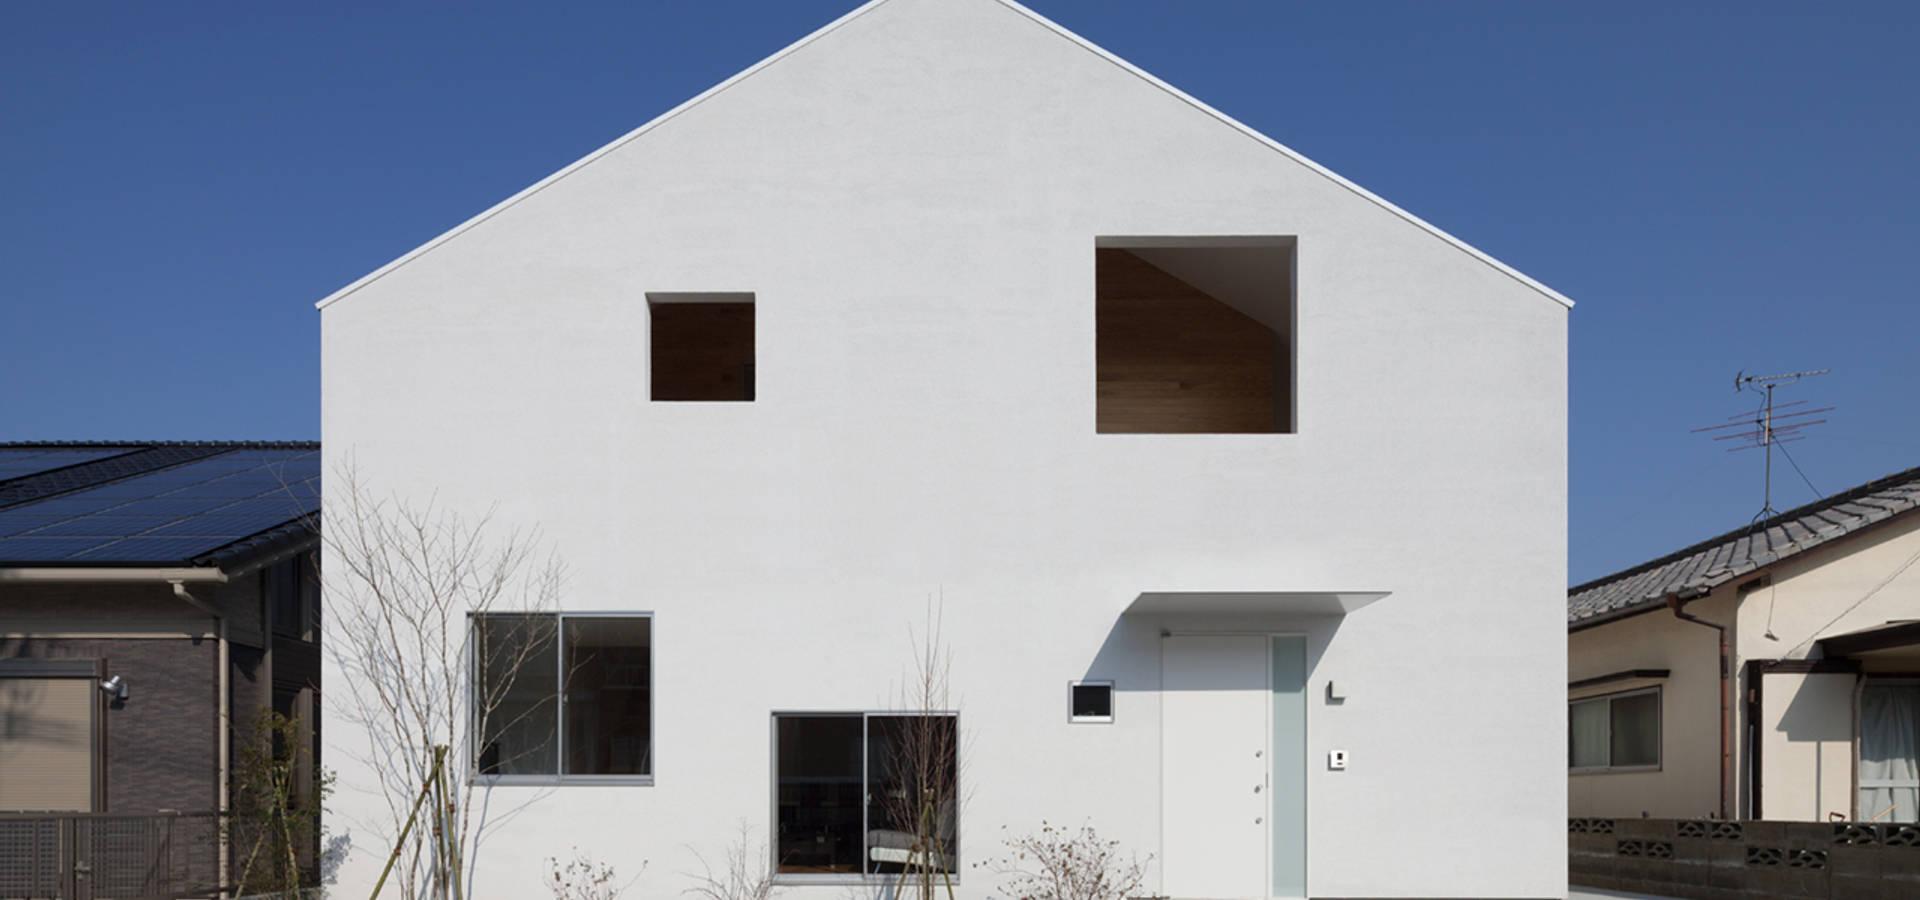 h2 Architect